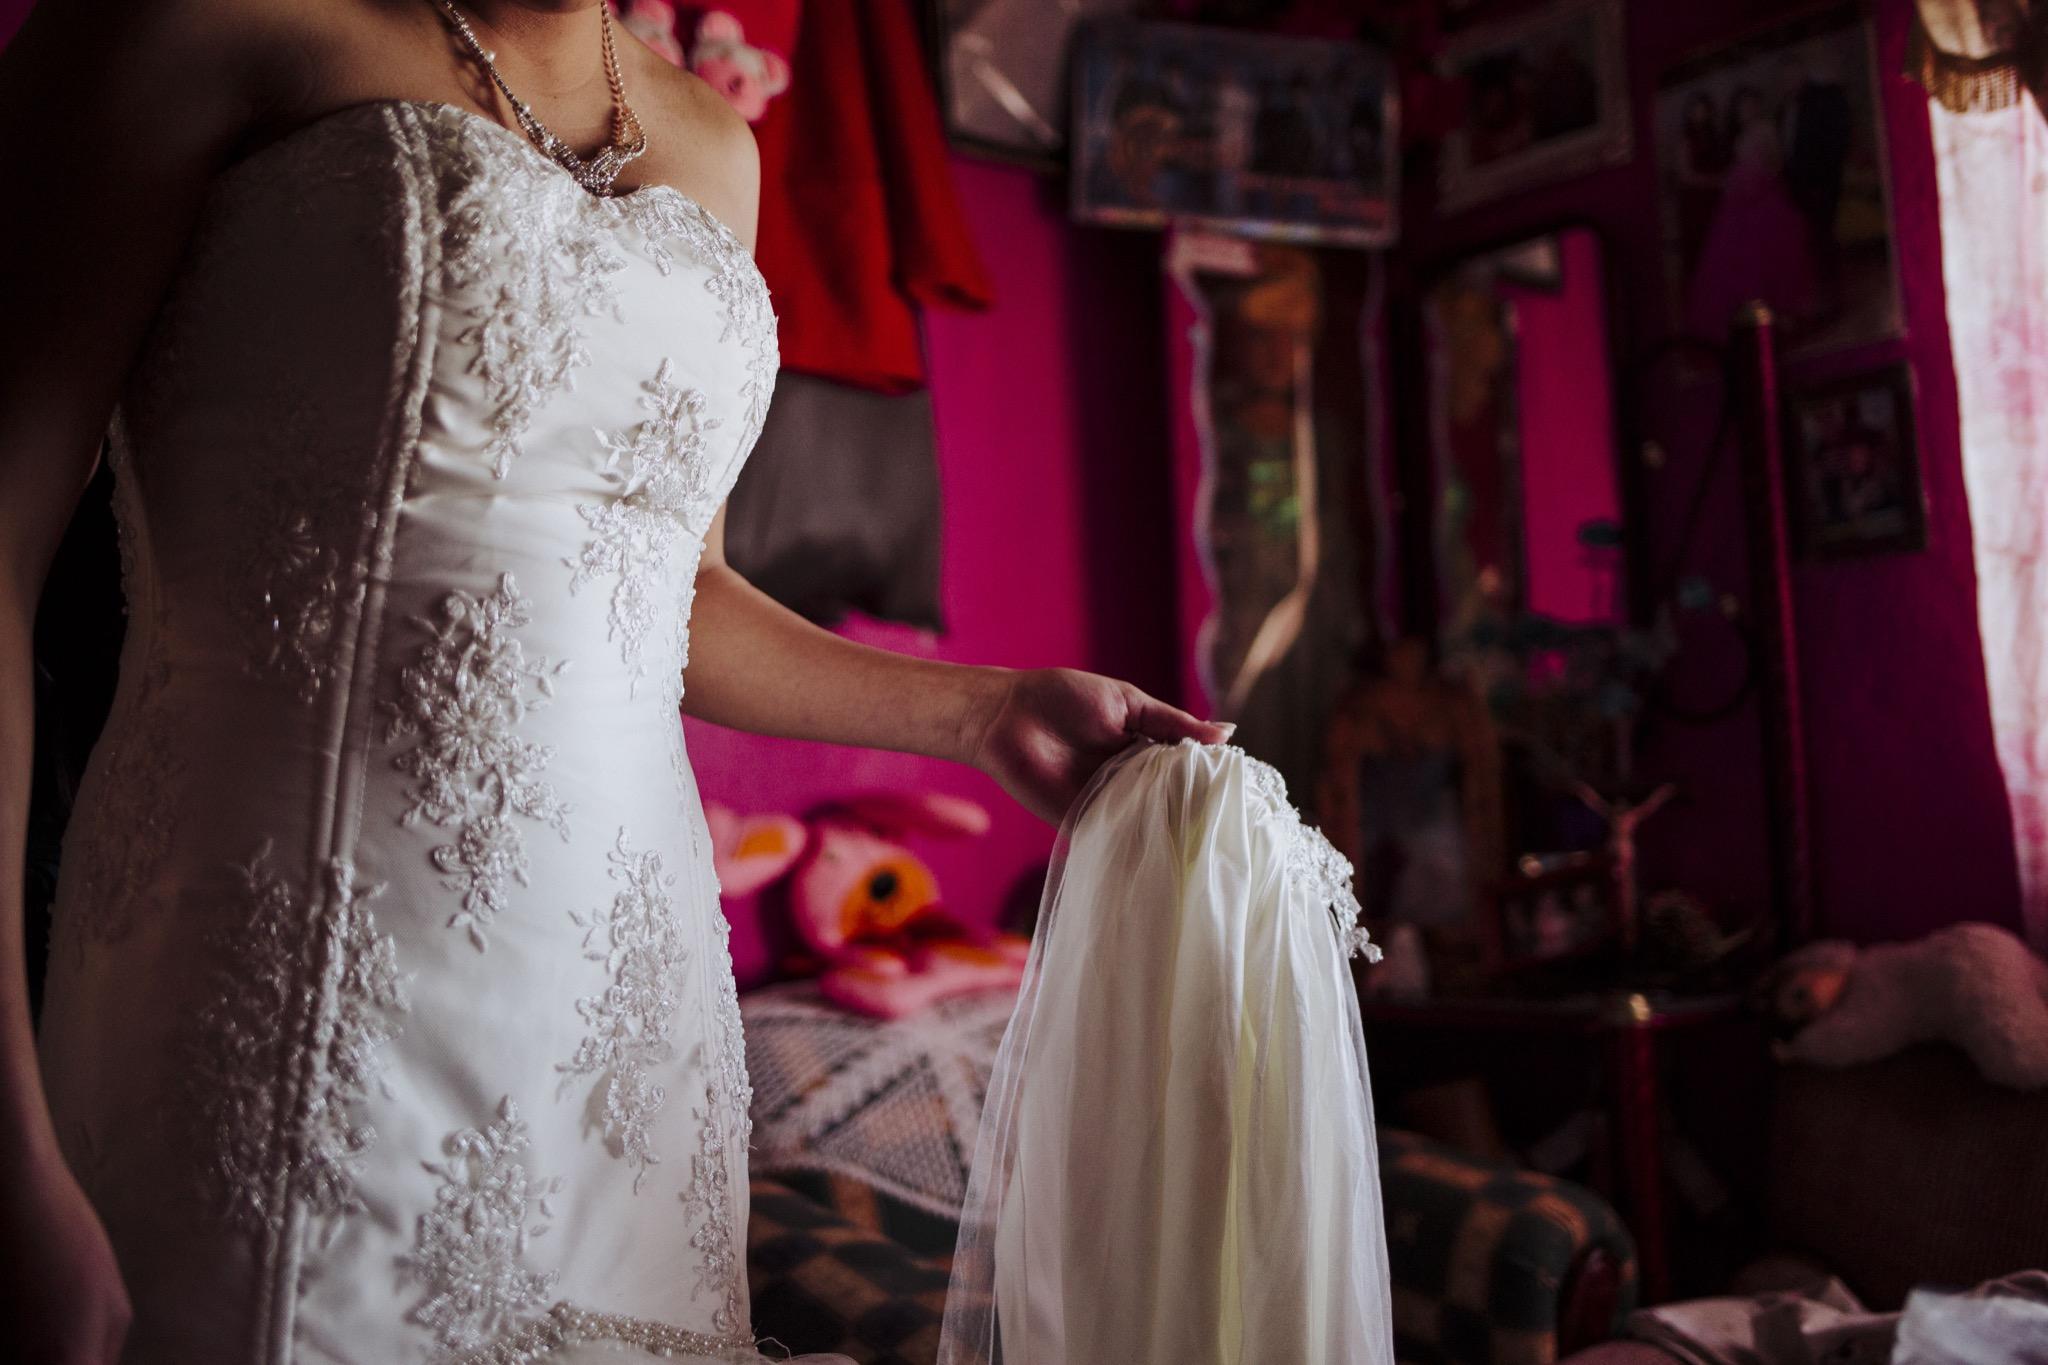 javier_noriega_fotografo_profesional_bodas_zacatecas_mexico_chihuahua_photographer_04